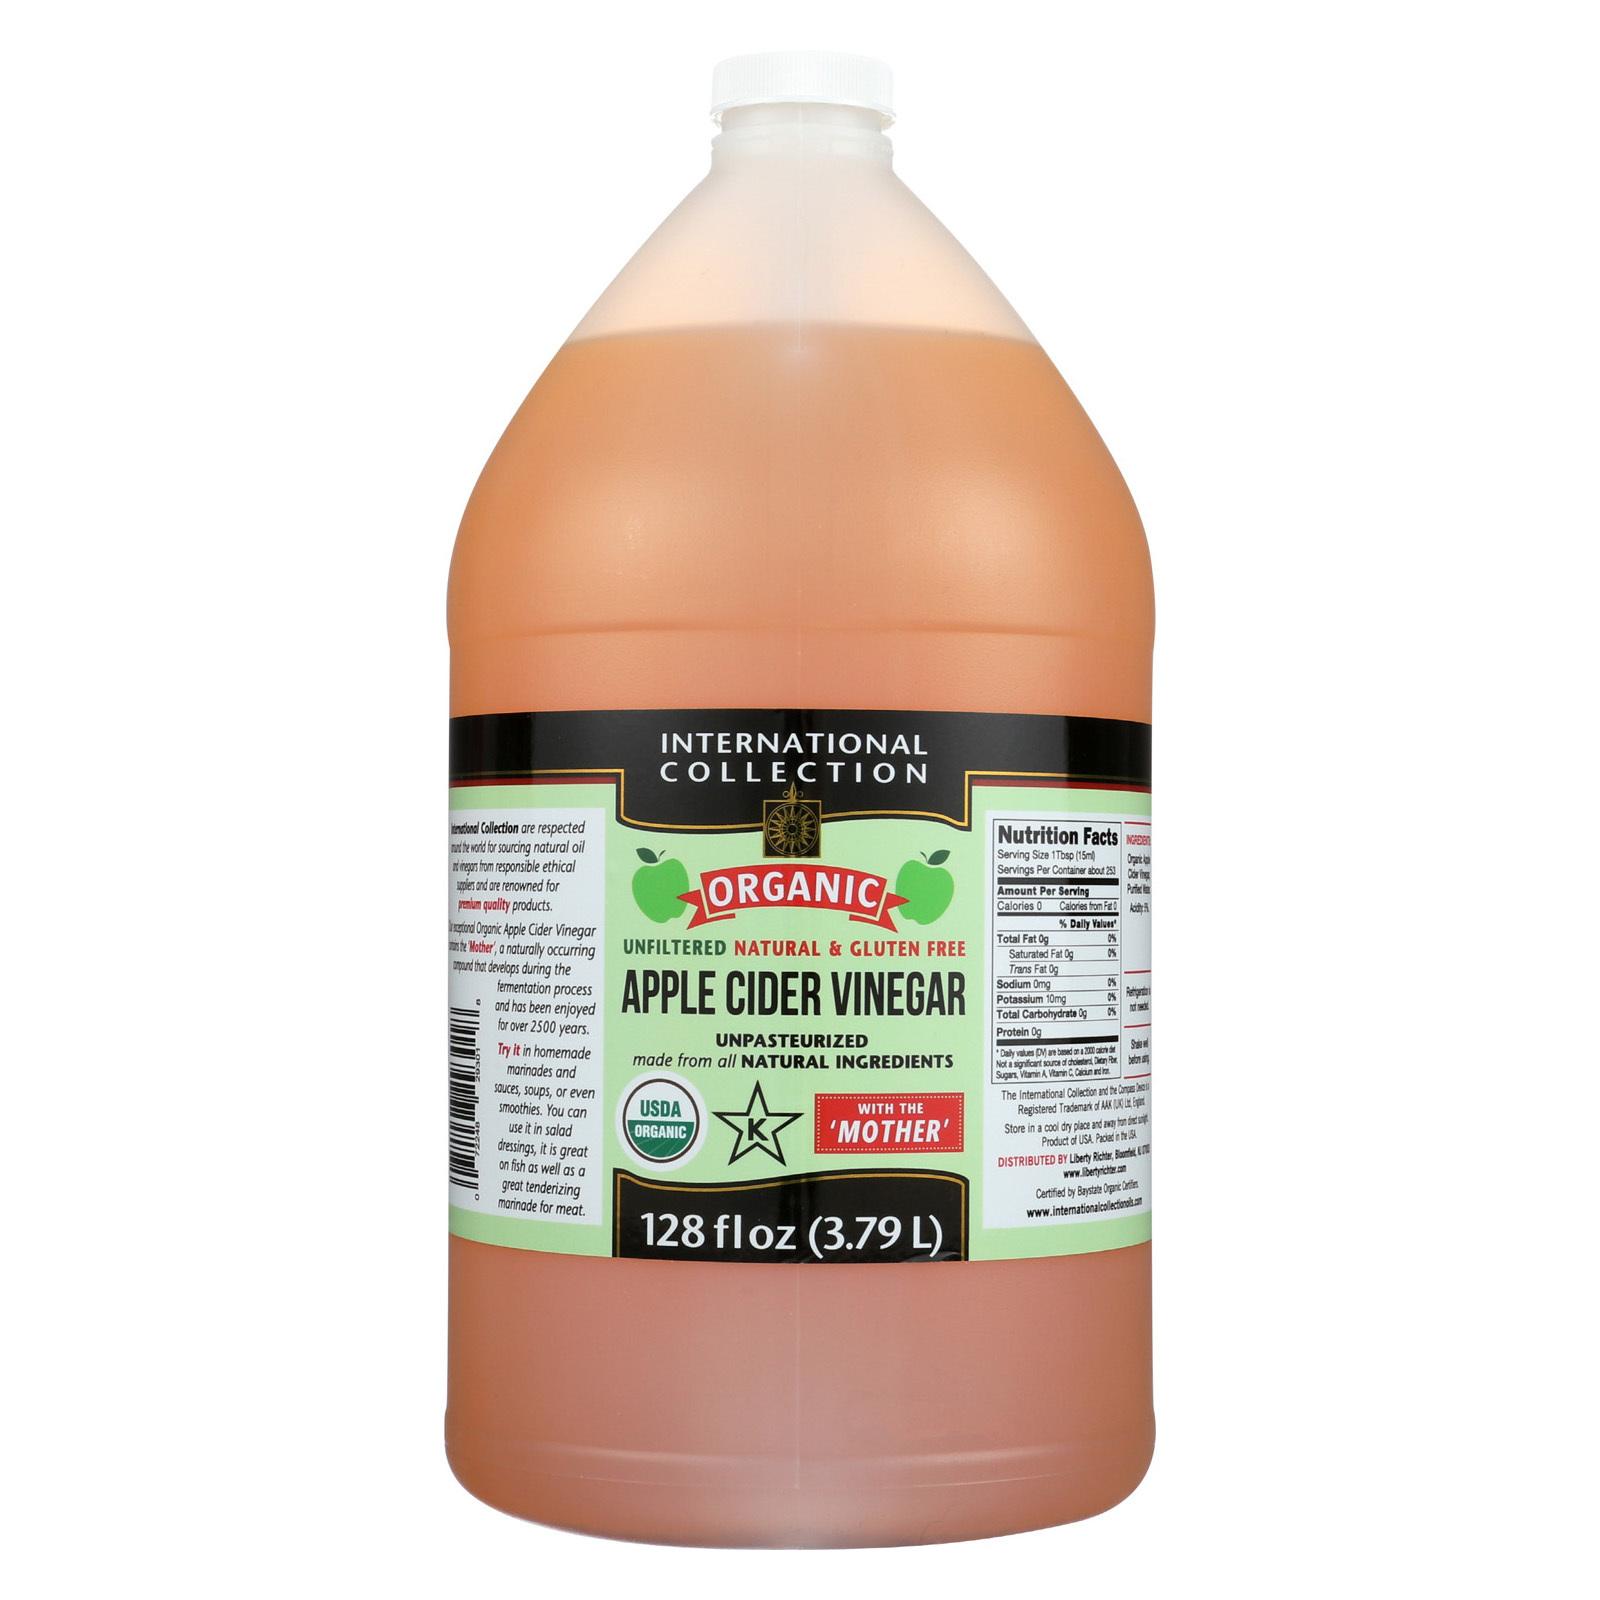 International Collection Vinegar - Organic - Apple Cider - Case of 4 - 128 fl oz